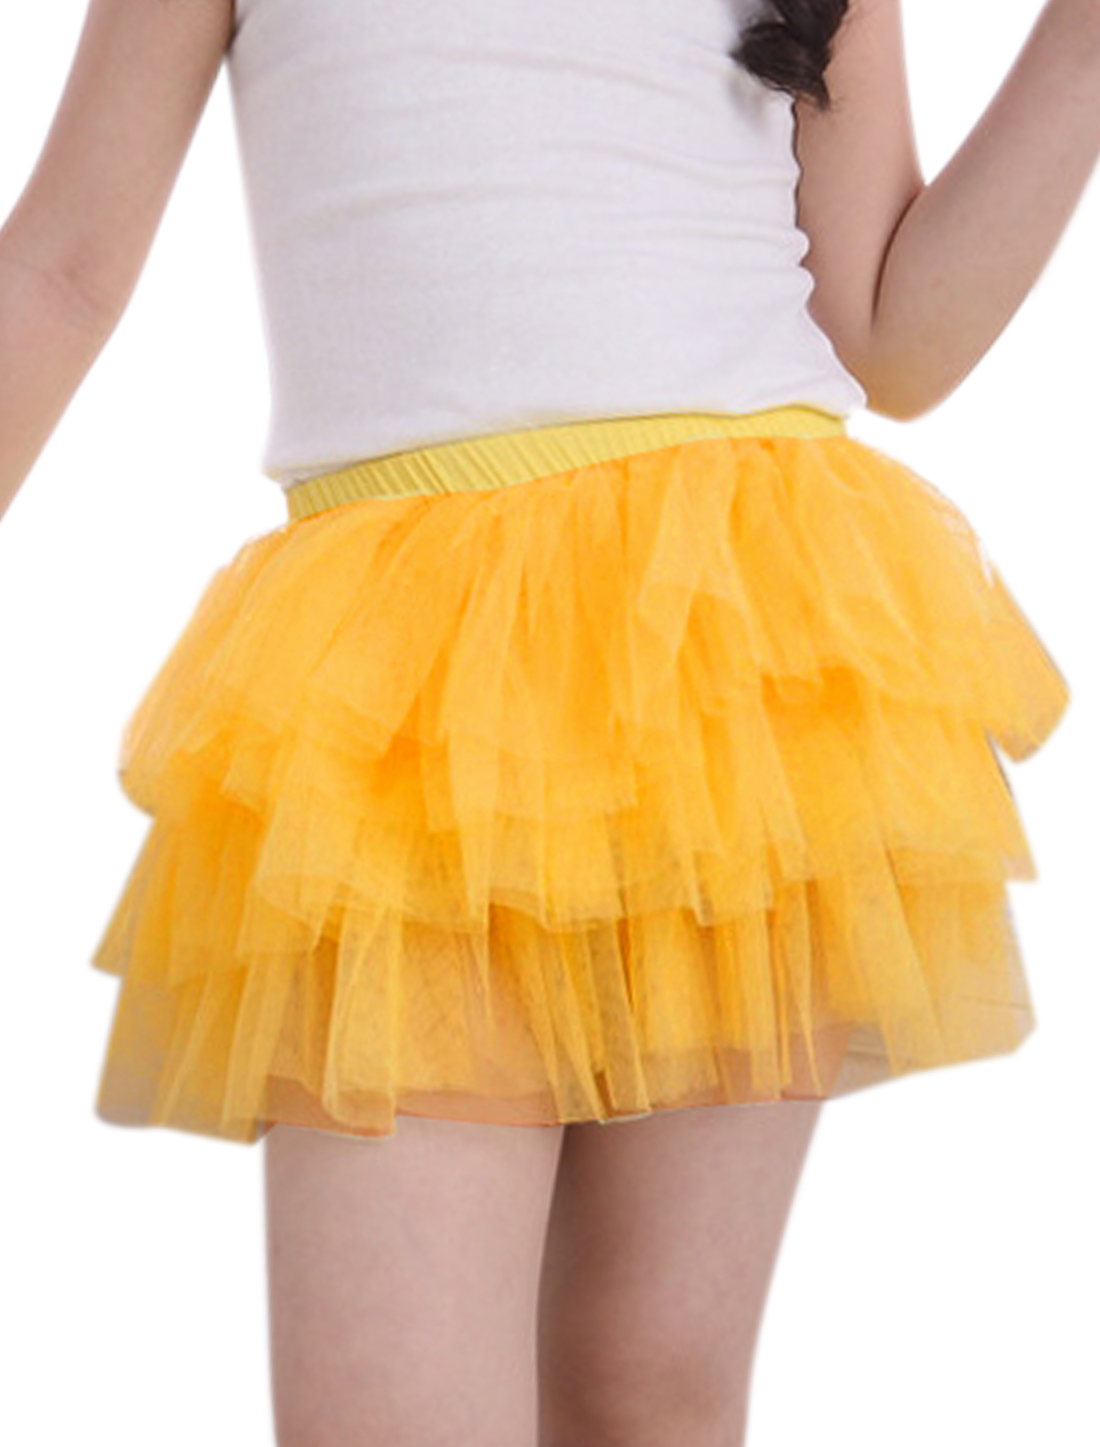 Girls Elastic Waist Mesh Panel Tiered A Line Skirt Yellow 6X